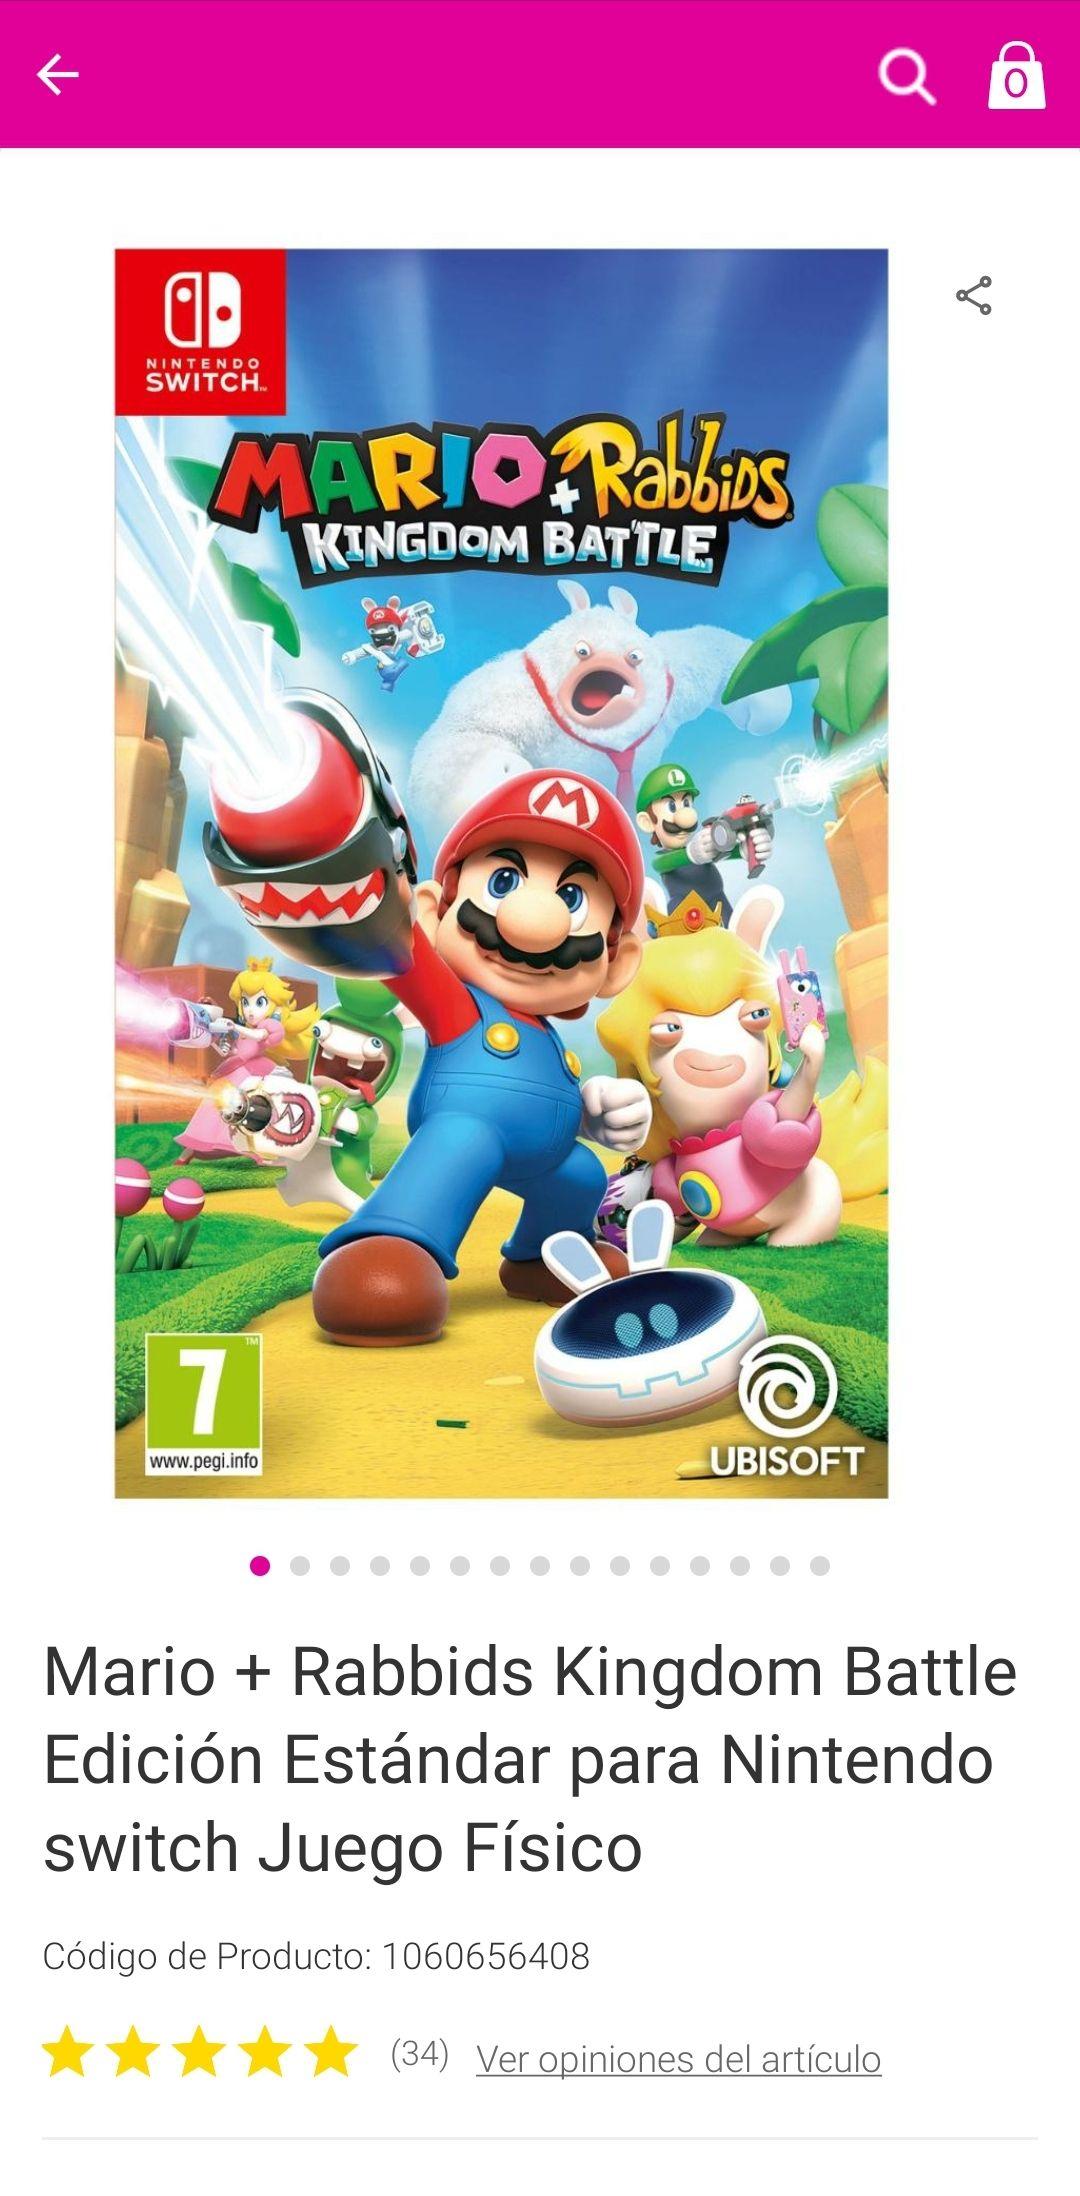 Liverpool: Mario + Rabbits Kingdom Battle switch